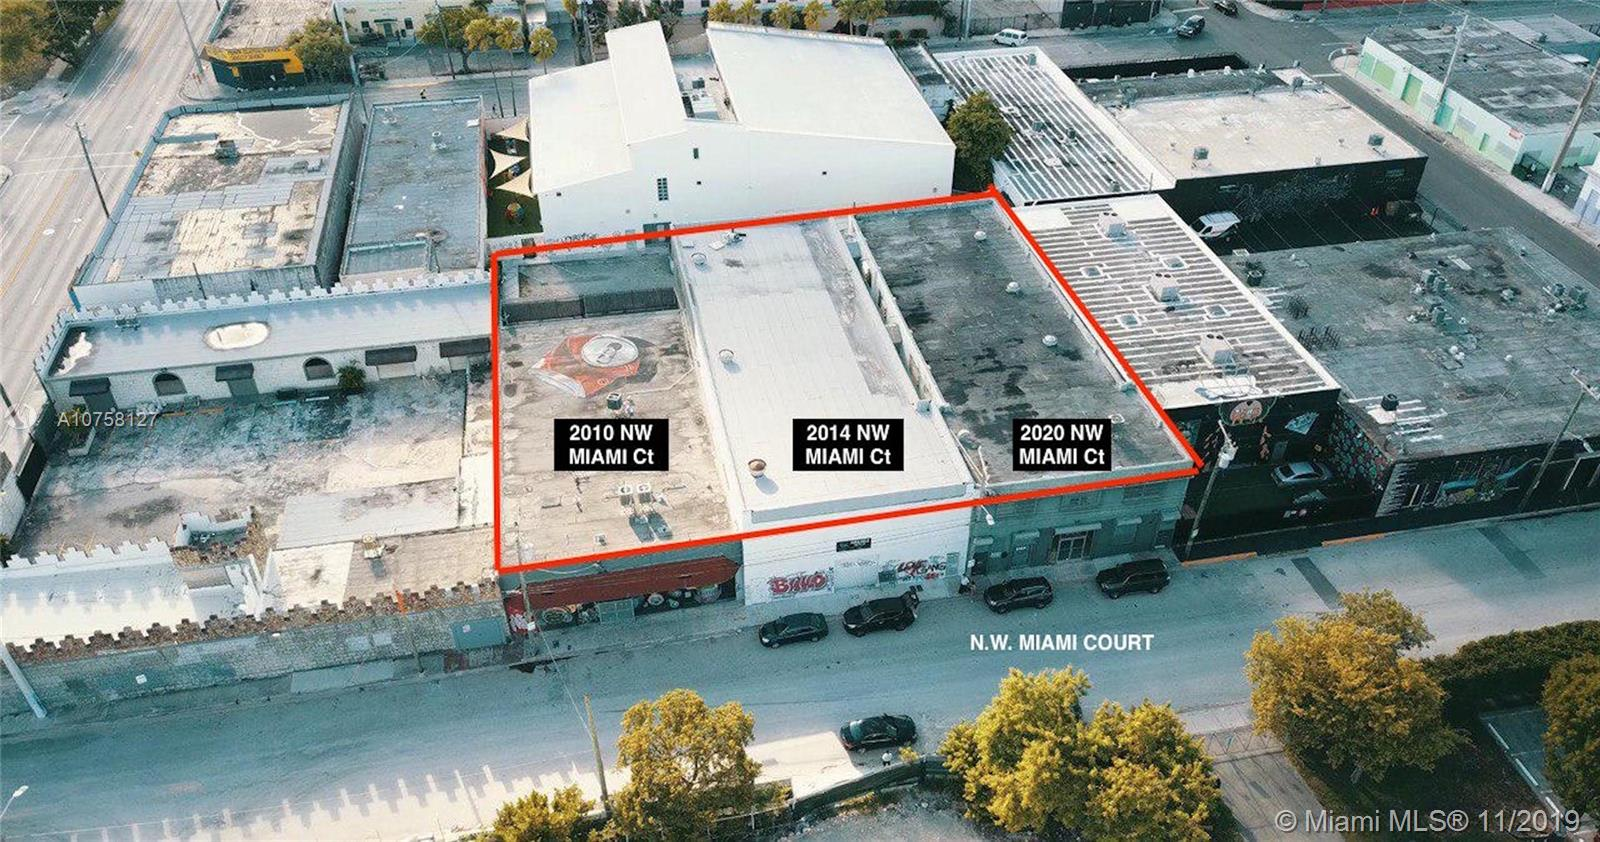 image #1 of property, 2010 2014 2020 Nw Miami Court